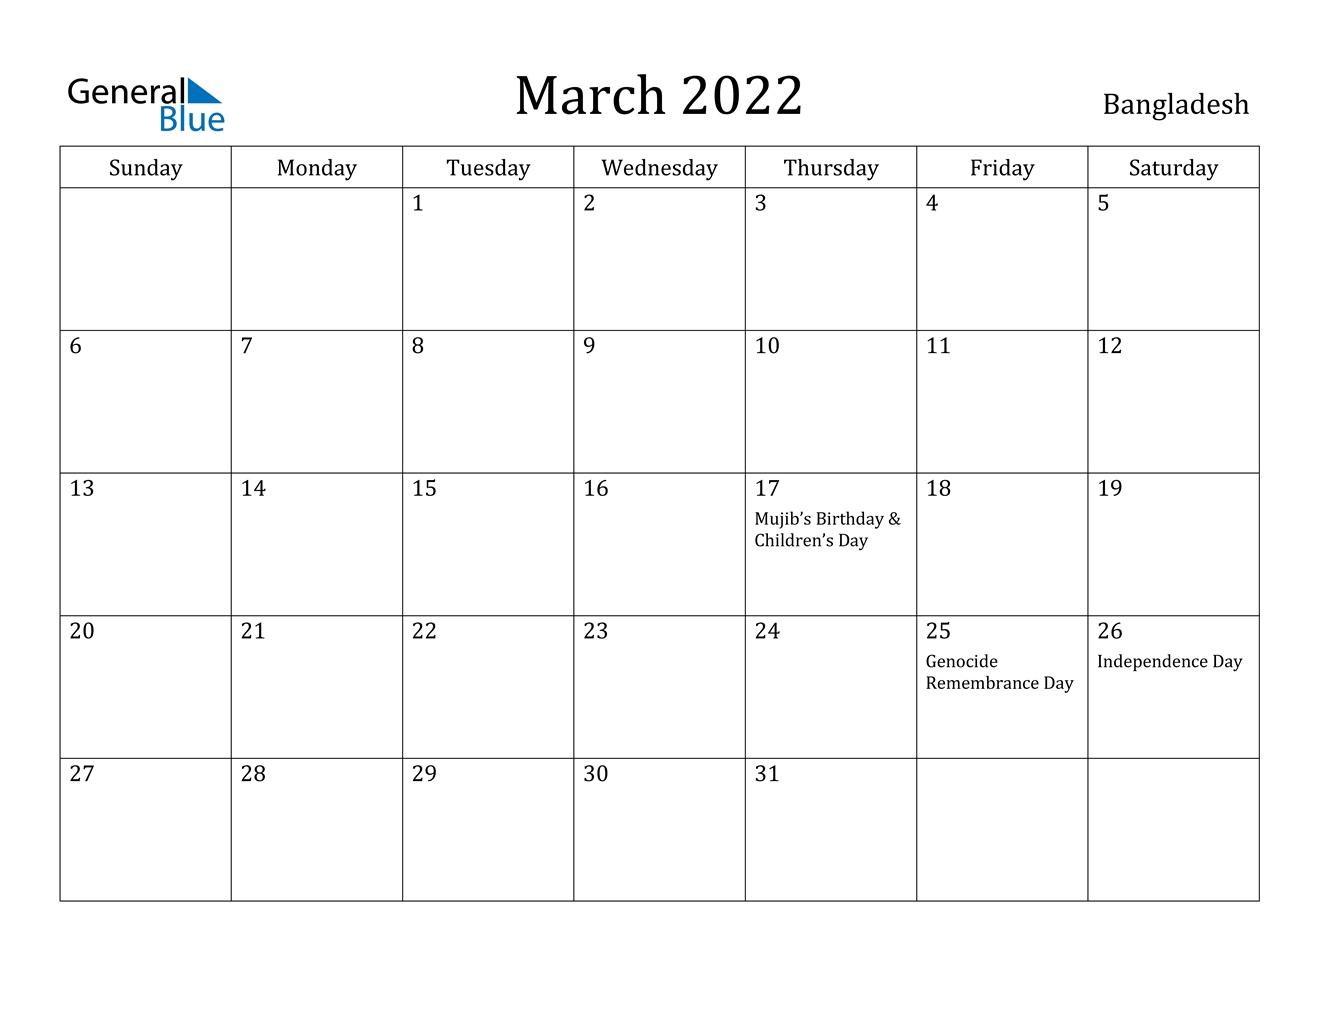 Bangladesh March 2022 Calendar With Holidays